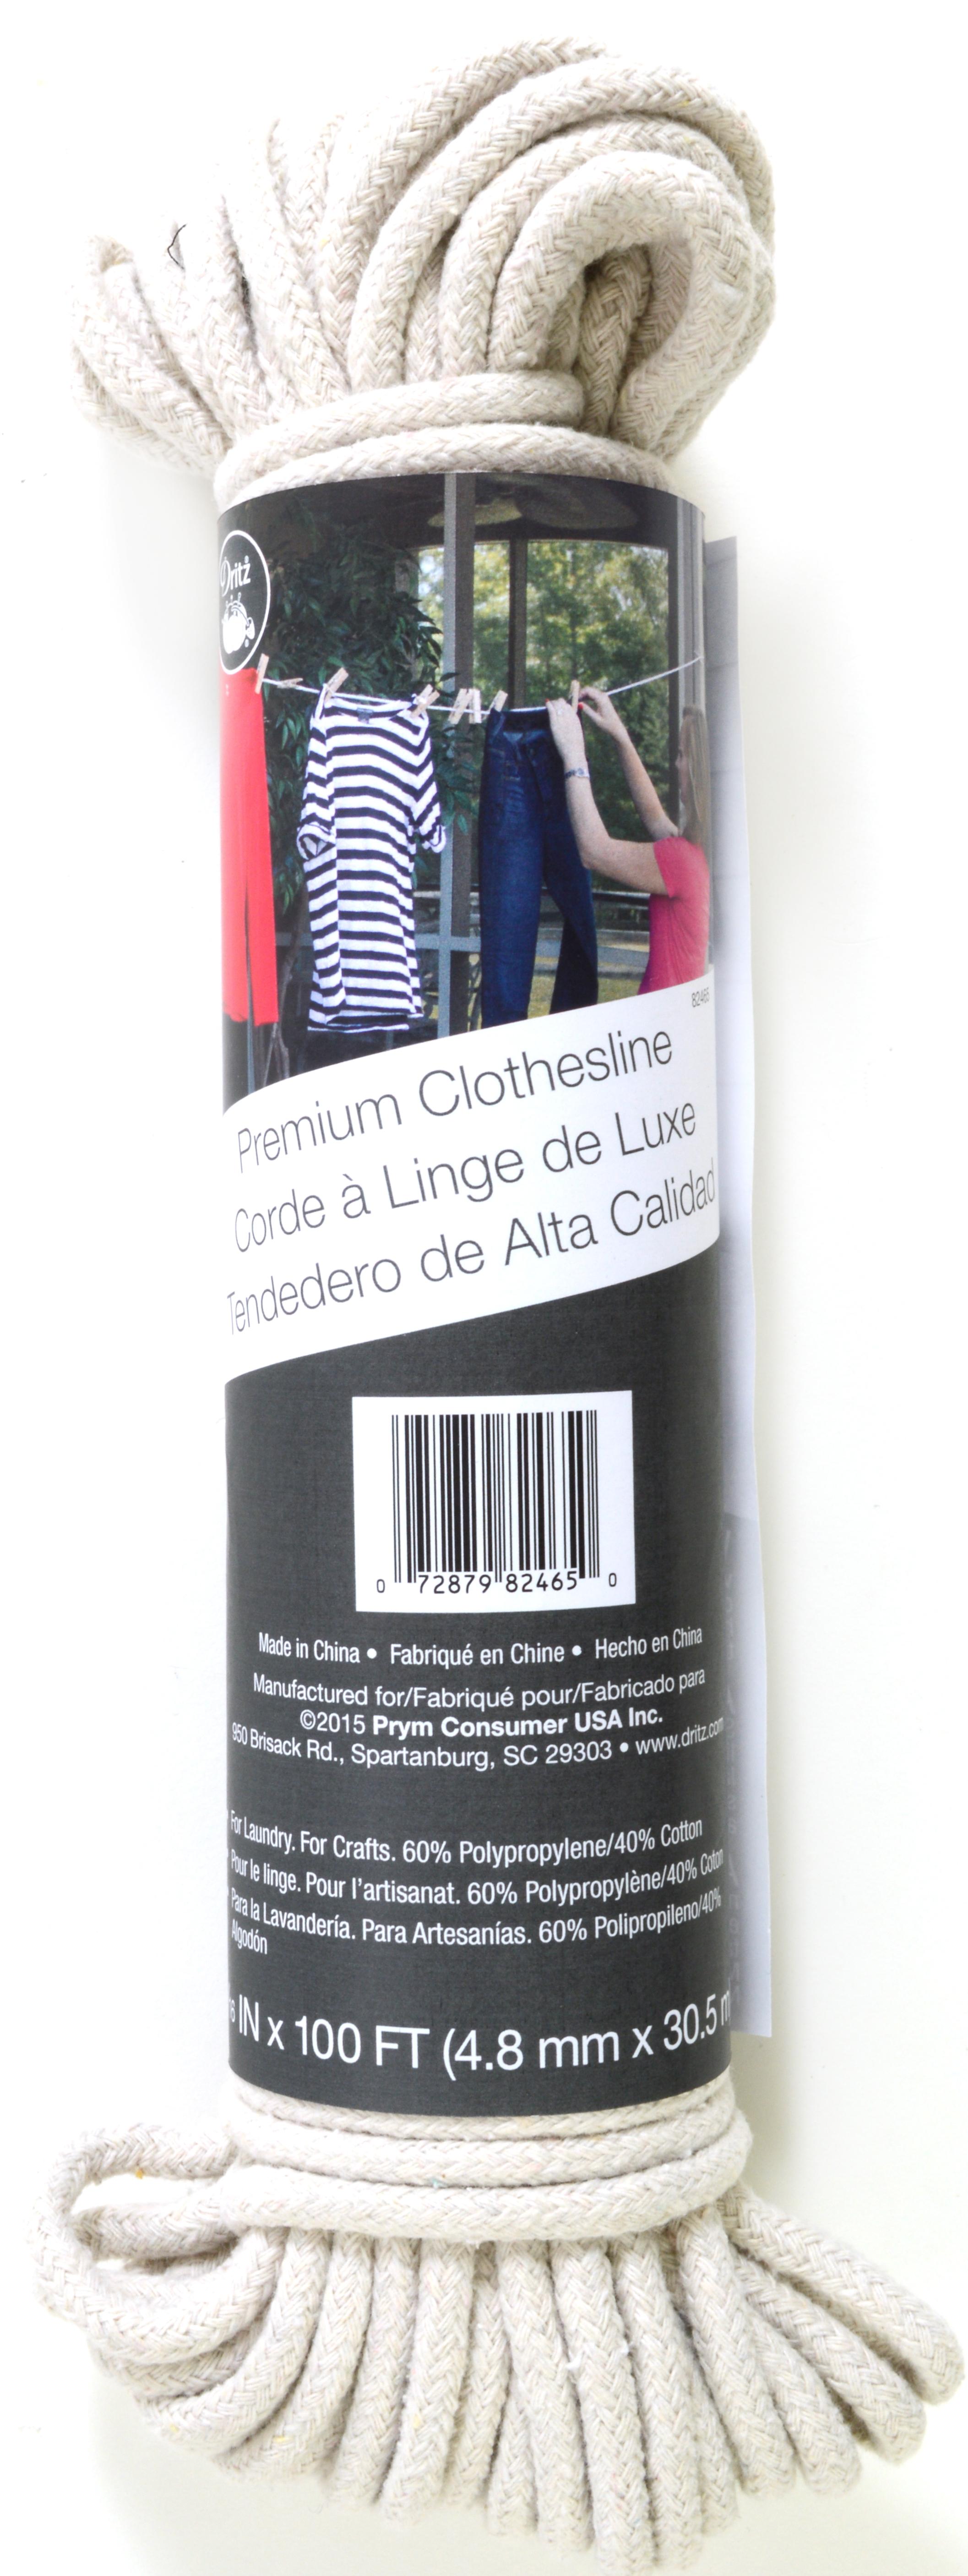 Premium Clothesline